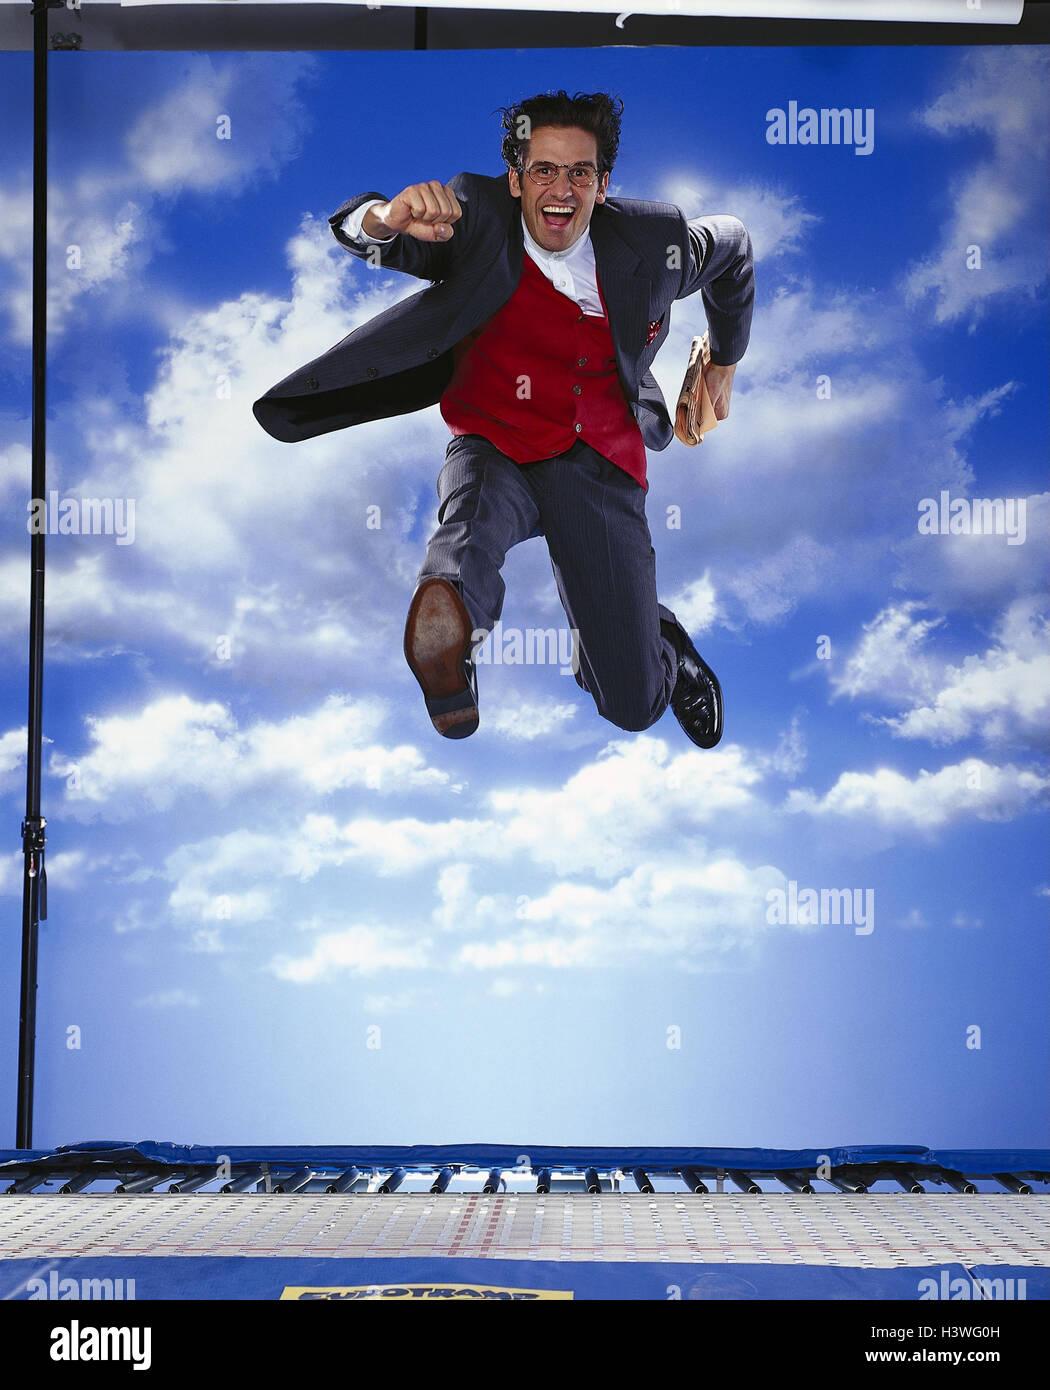 Manager, magazine, caper, cloudy sky businessman, man, crack